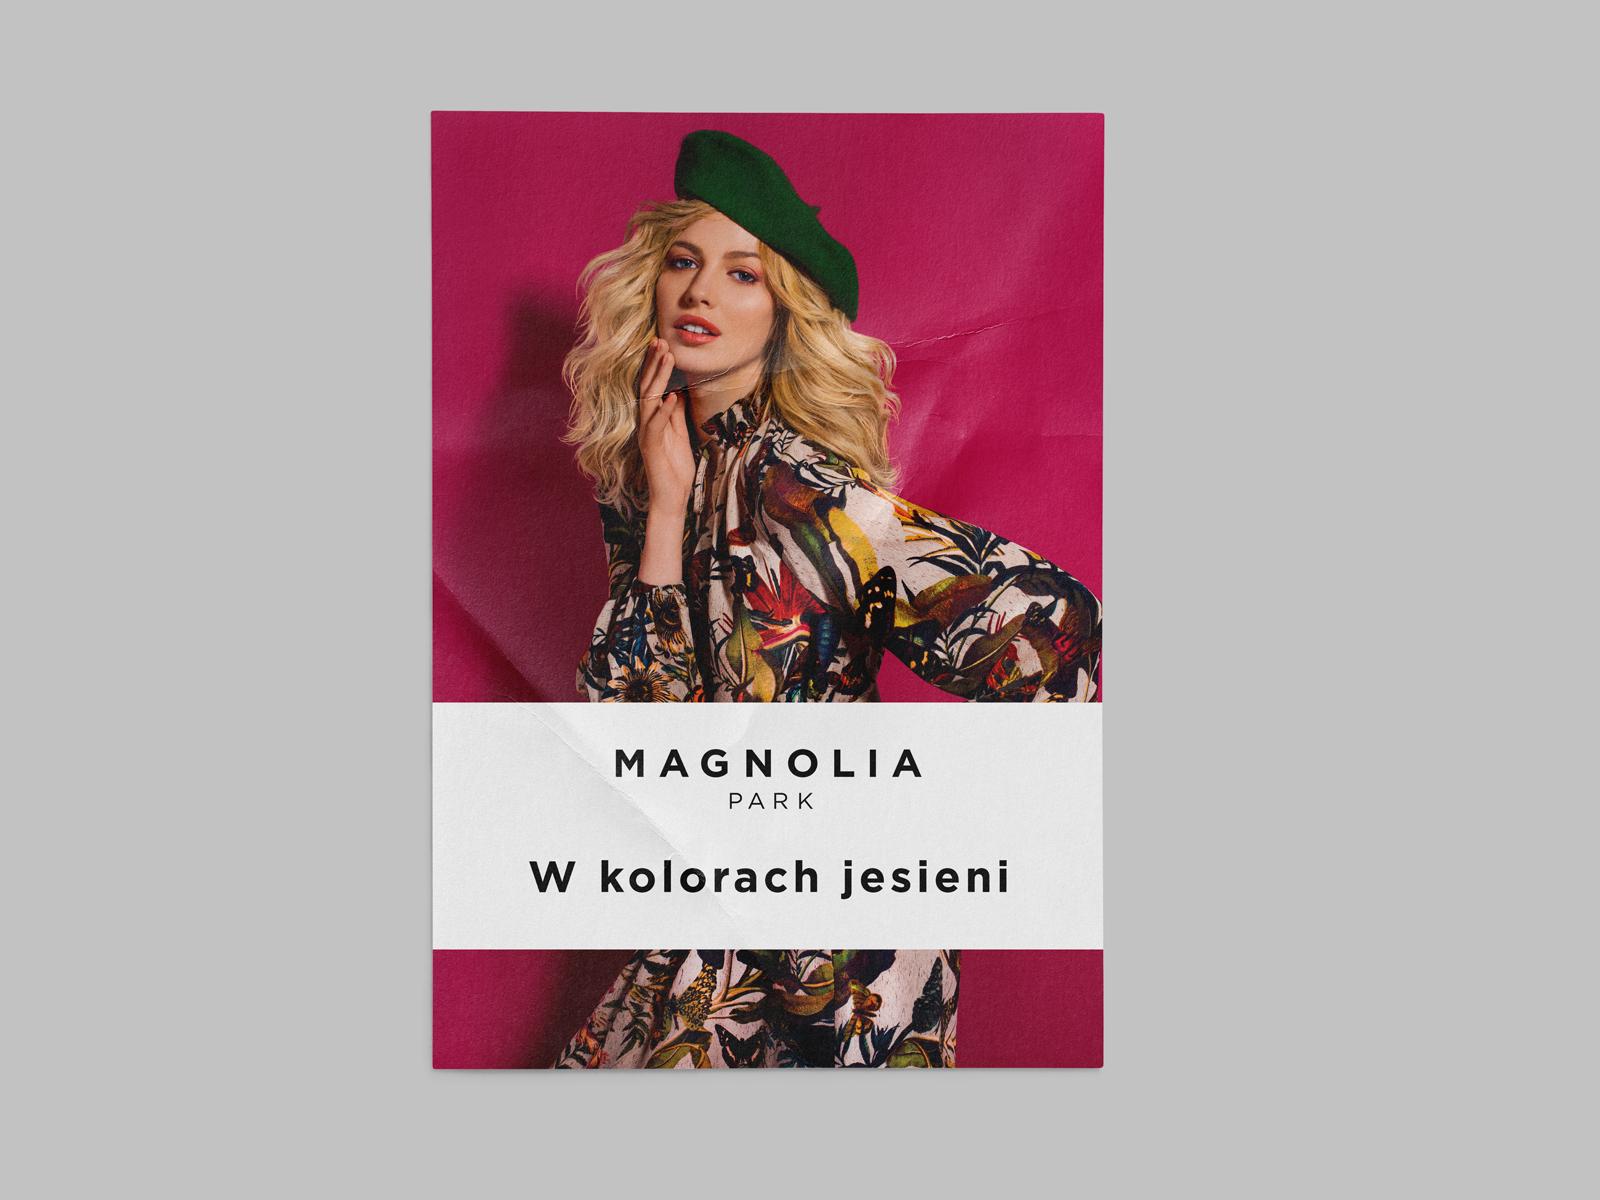 magnolia_new_8